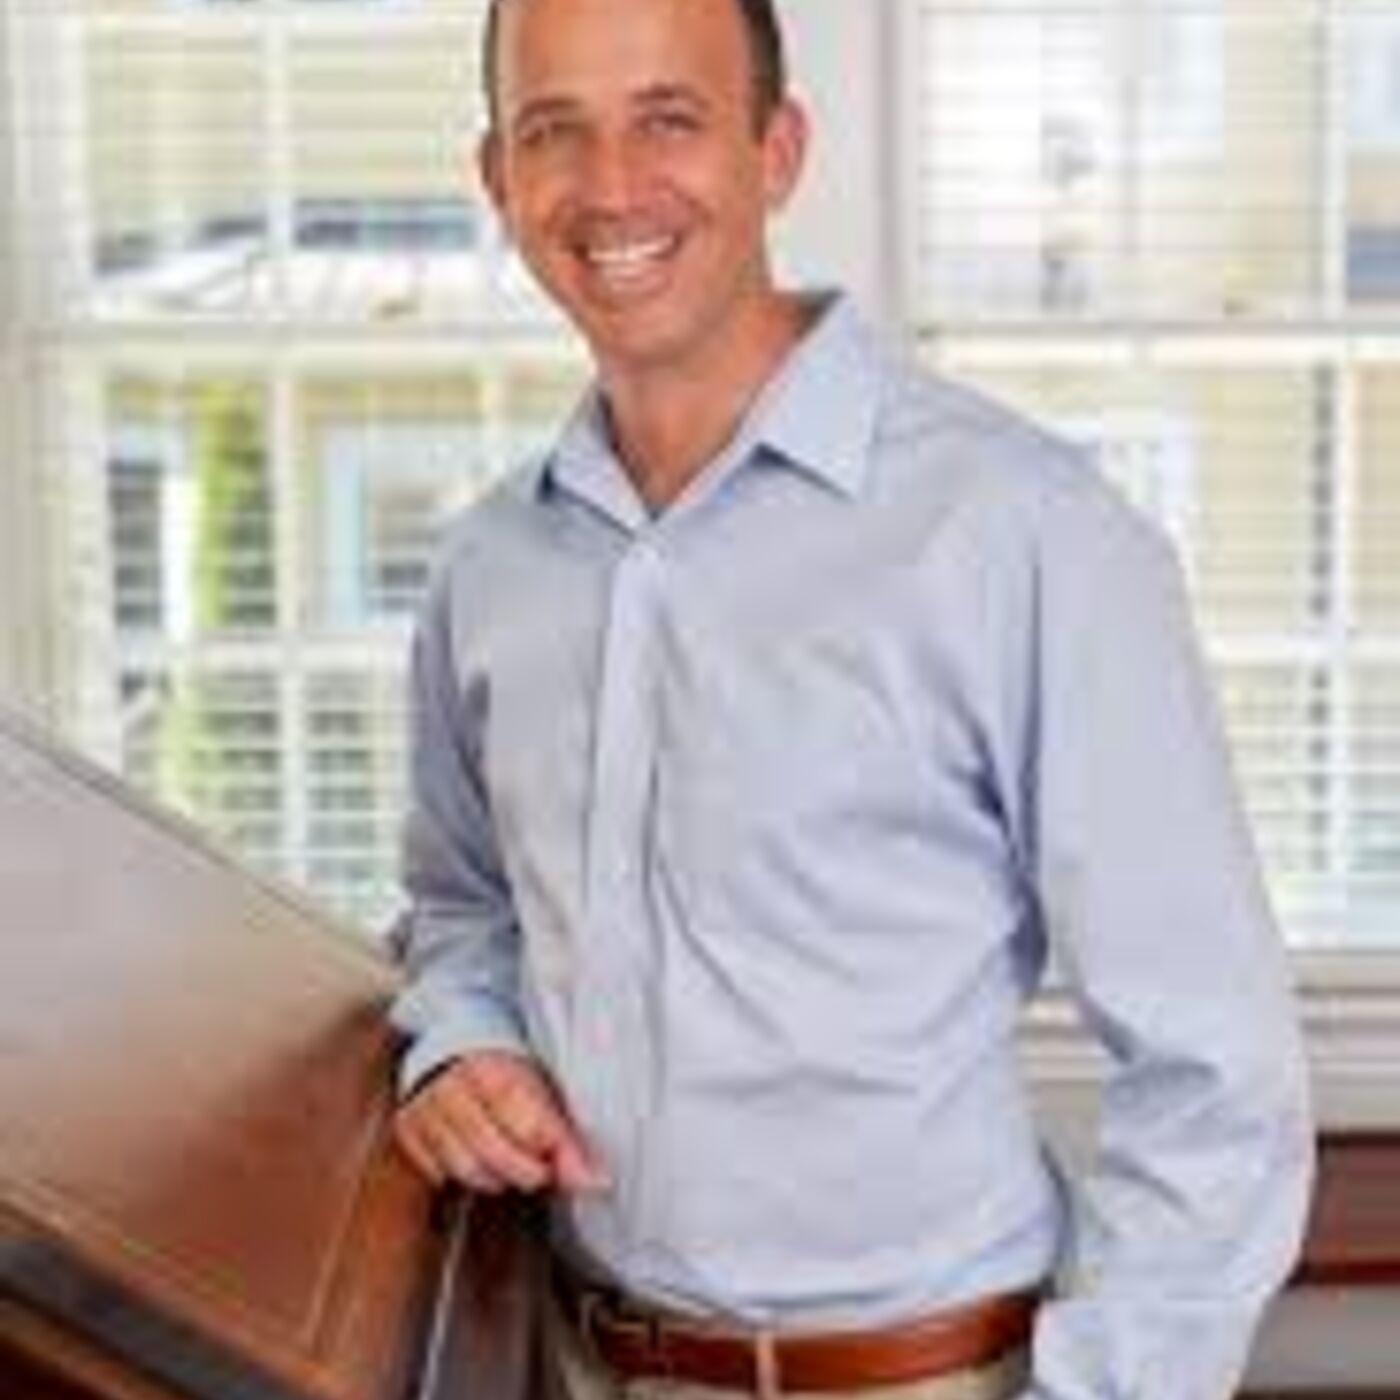 Damon Circosta (Part 1) Chair, NC Board of Elections